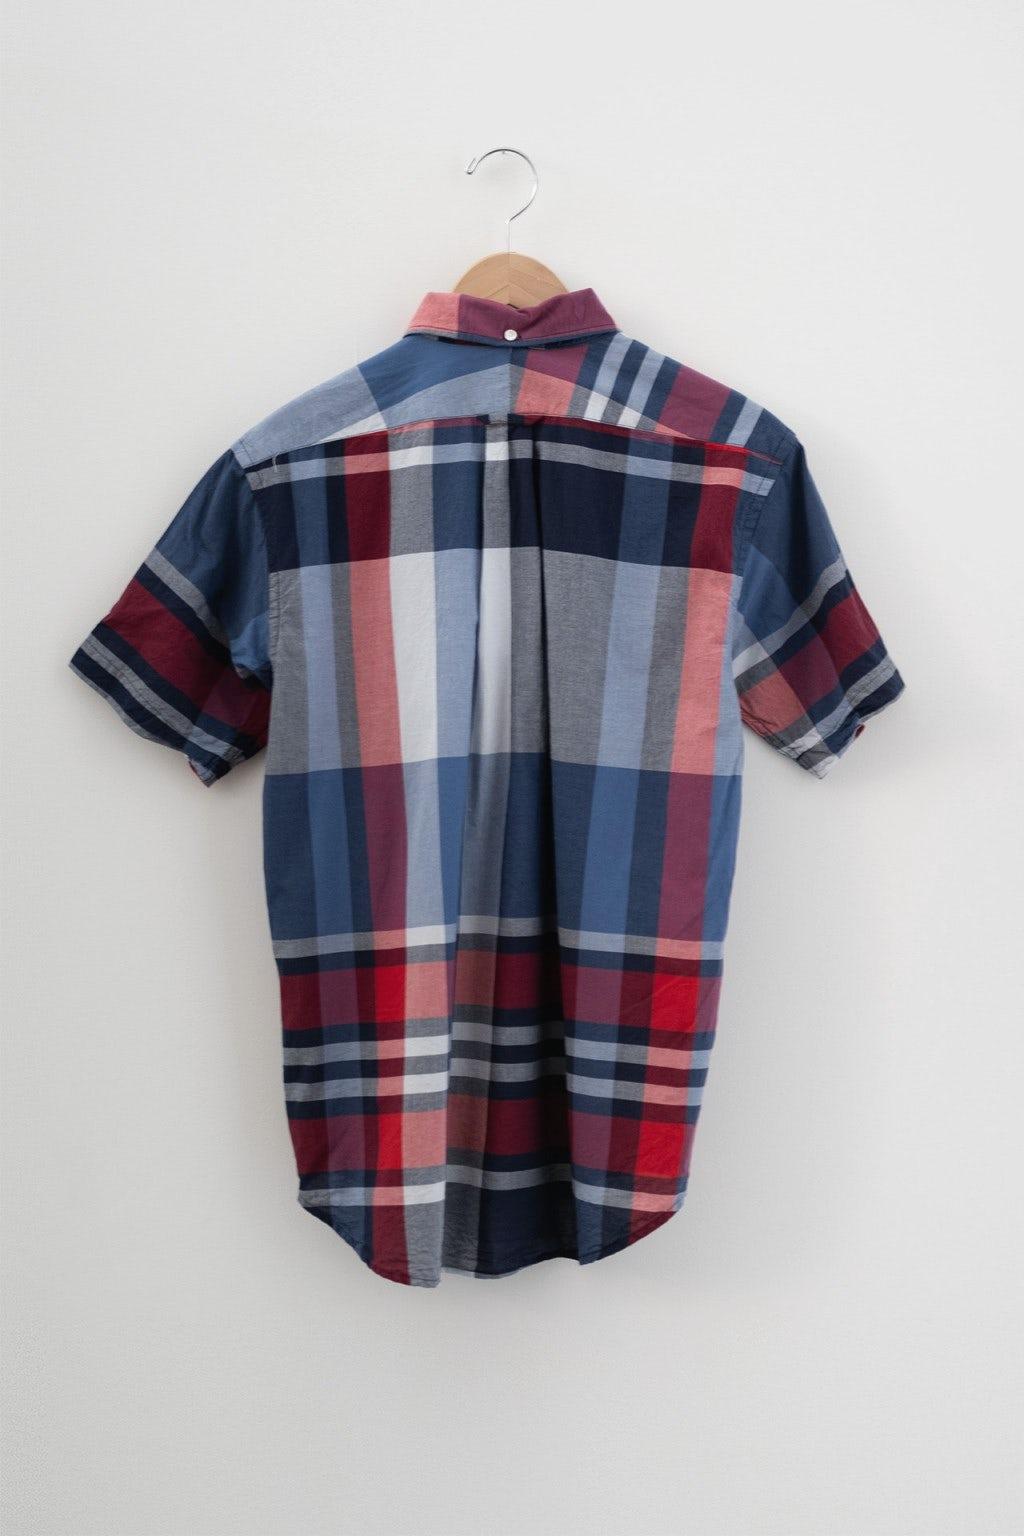 Engineered Garments Popover BD Shirt Navy/Red Big Madras Plaid